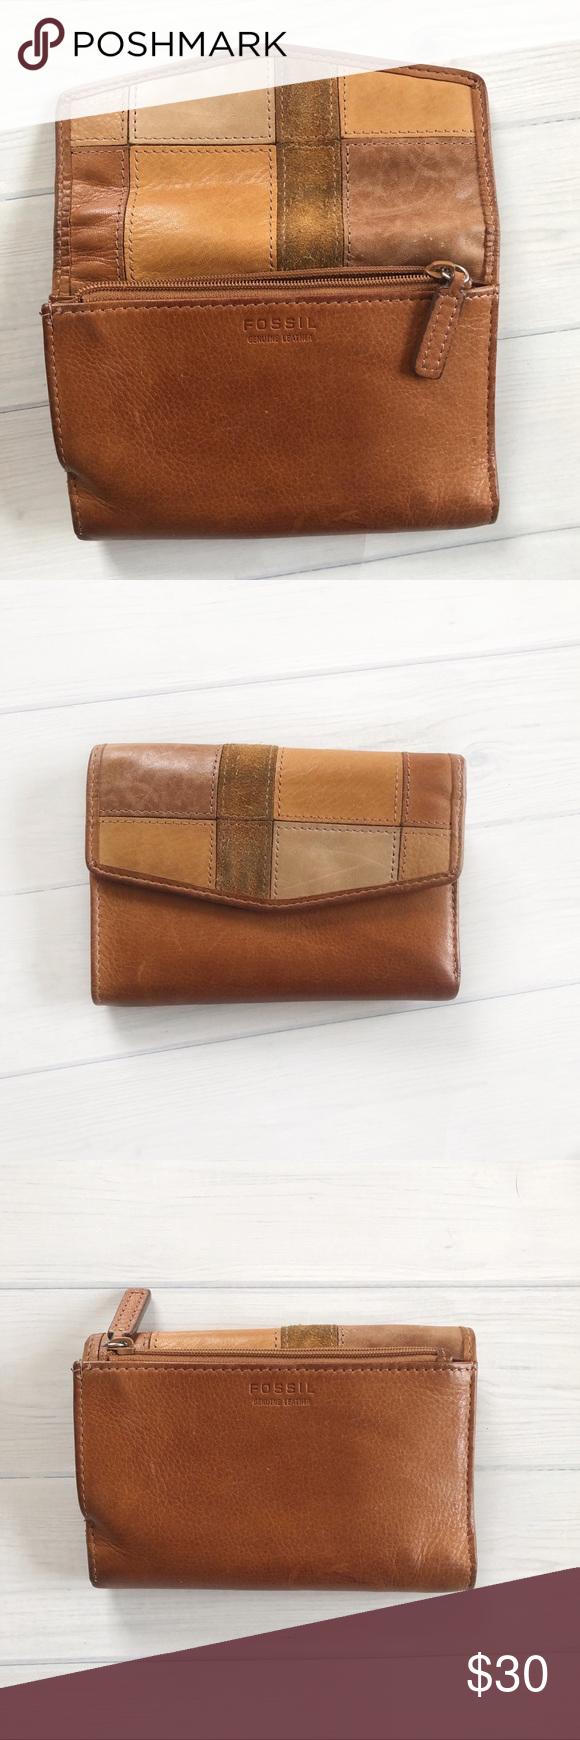 Fossil Leather Women S Wallet Leather Women Leather Wallet